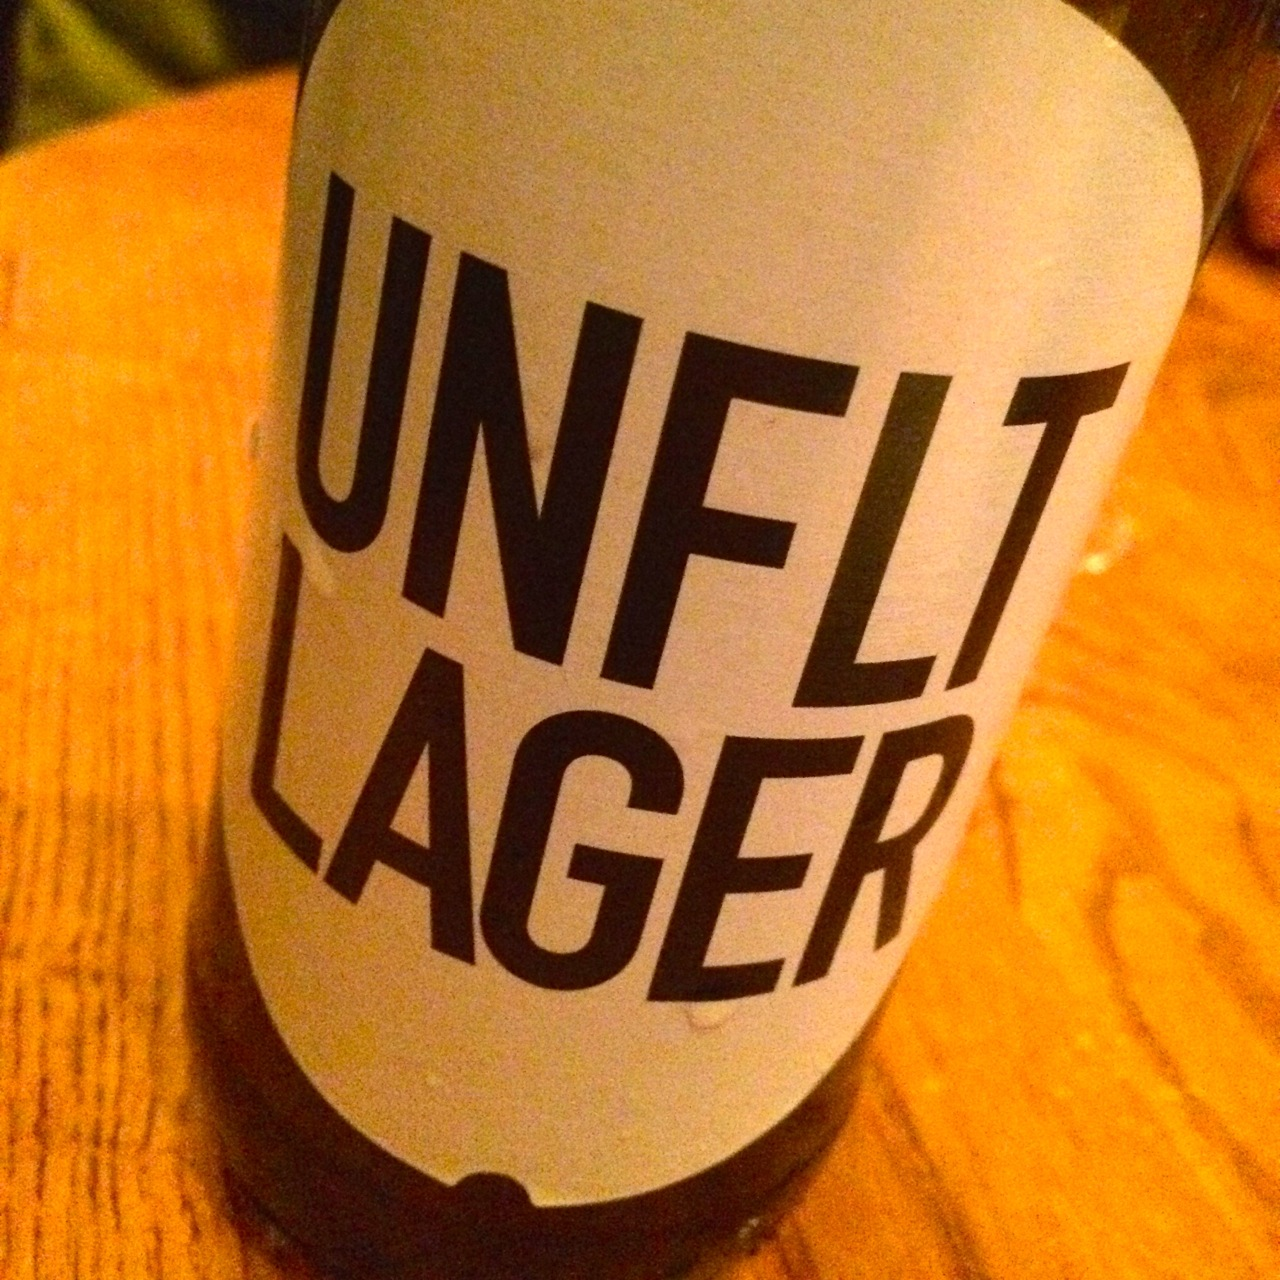 http://i2.wp.com/fatgayvegan.com/wp-content/uploads/2015/07/unfiltered-lager-and-union.jpg?fit=1280%2C1280